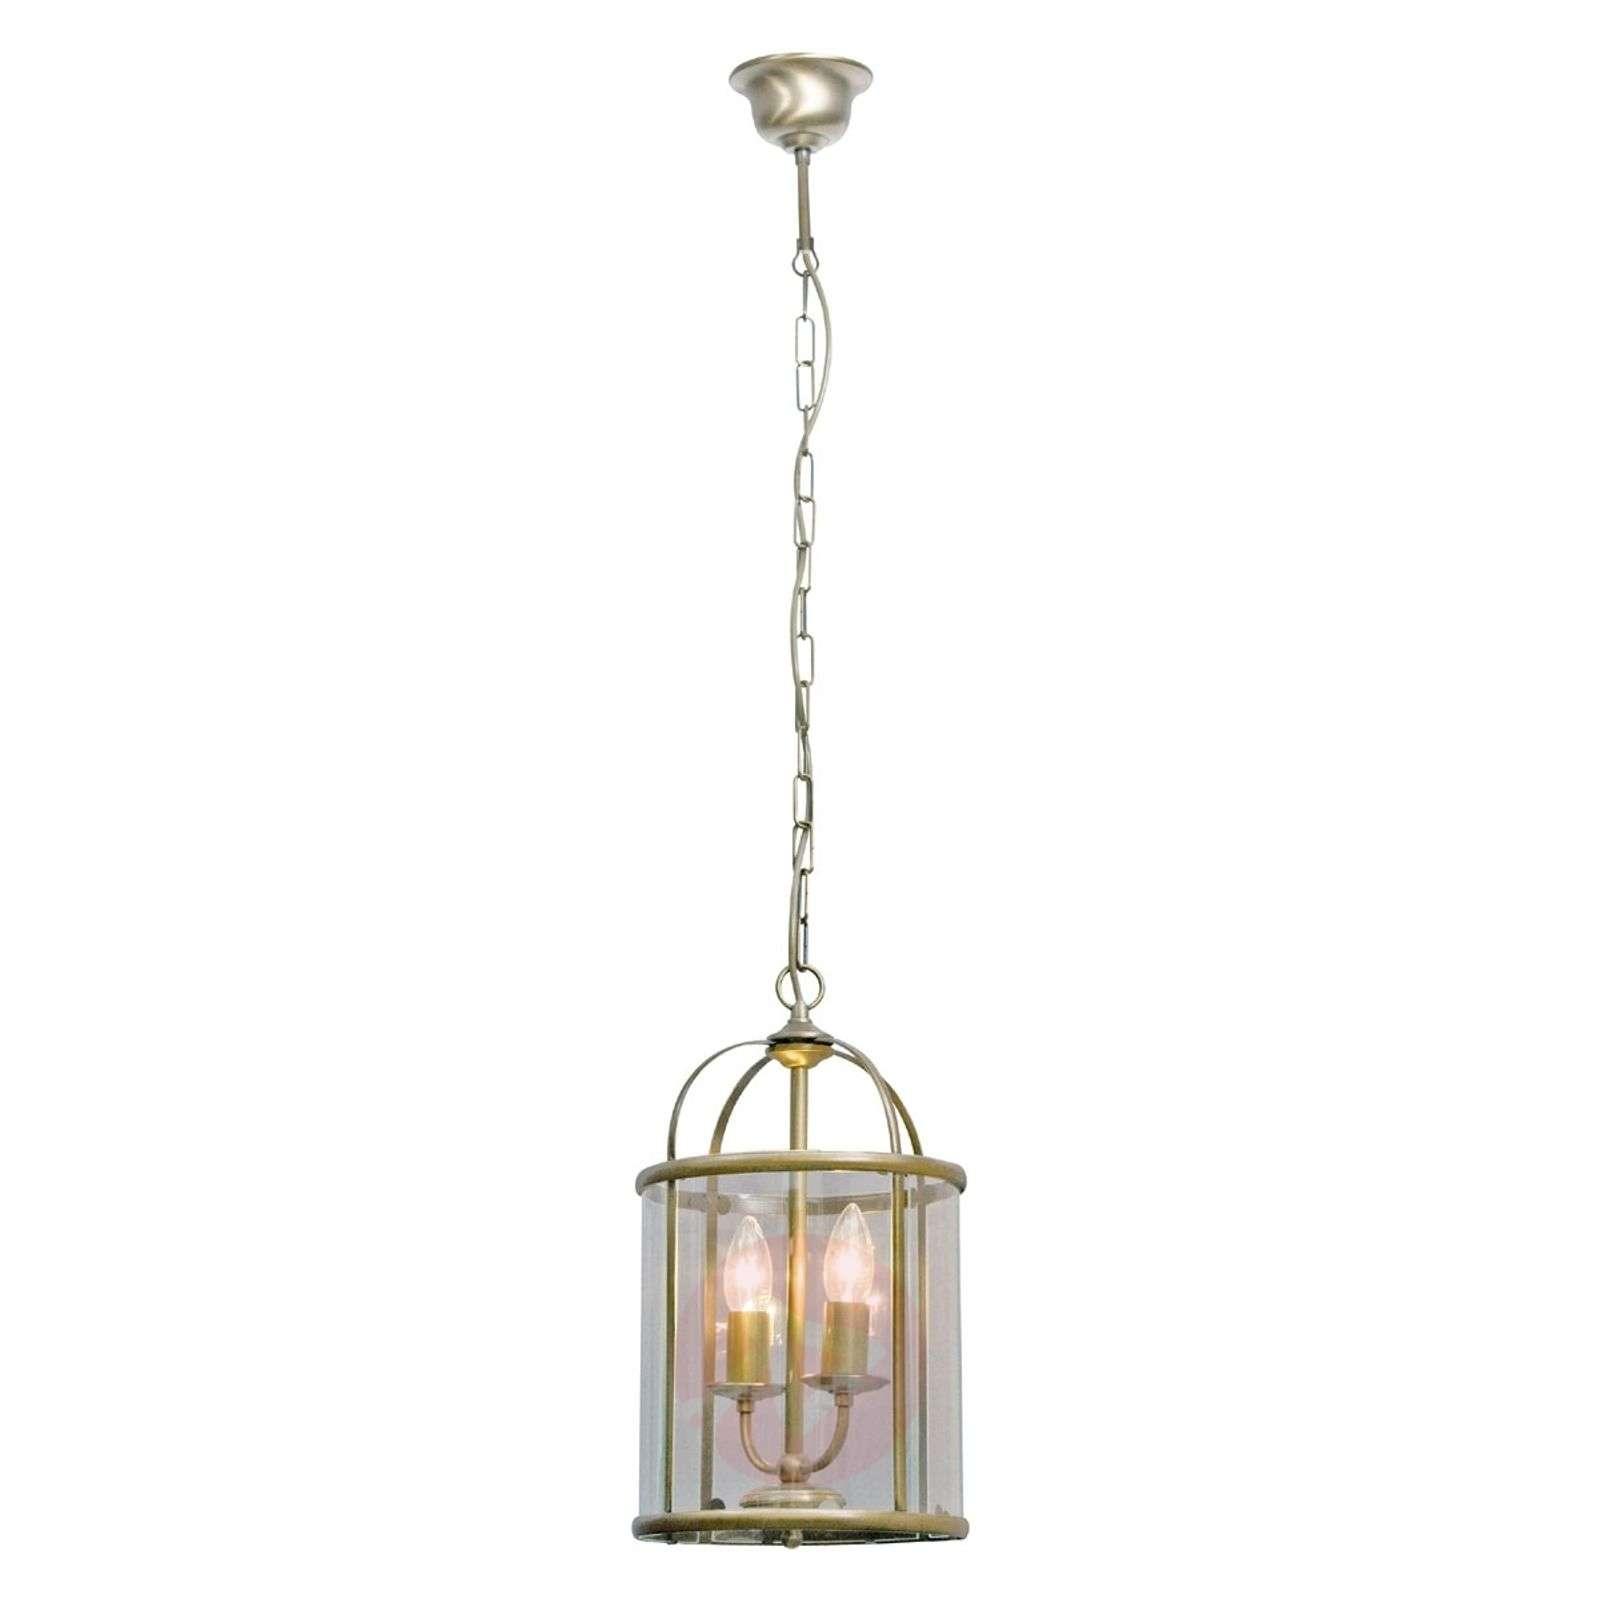 Decorative Pimpernel hanging light-8509461X-01